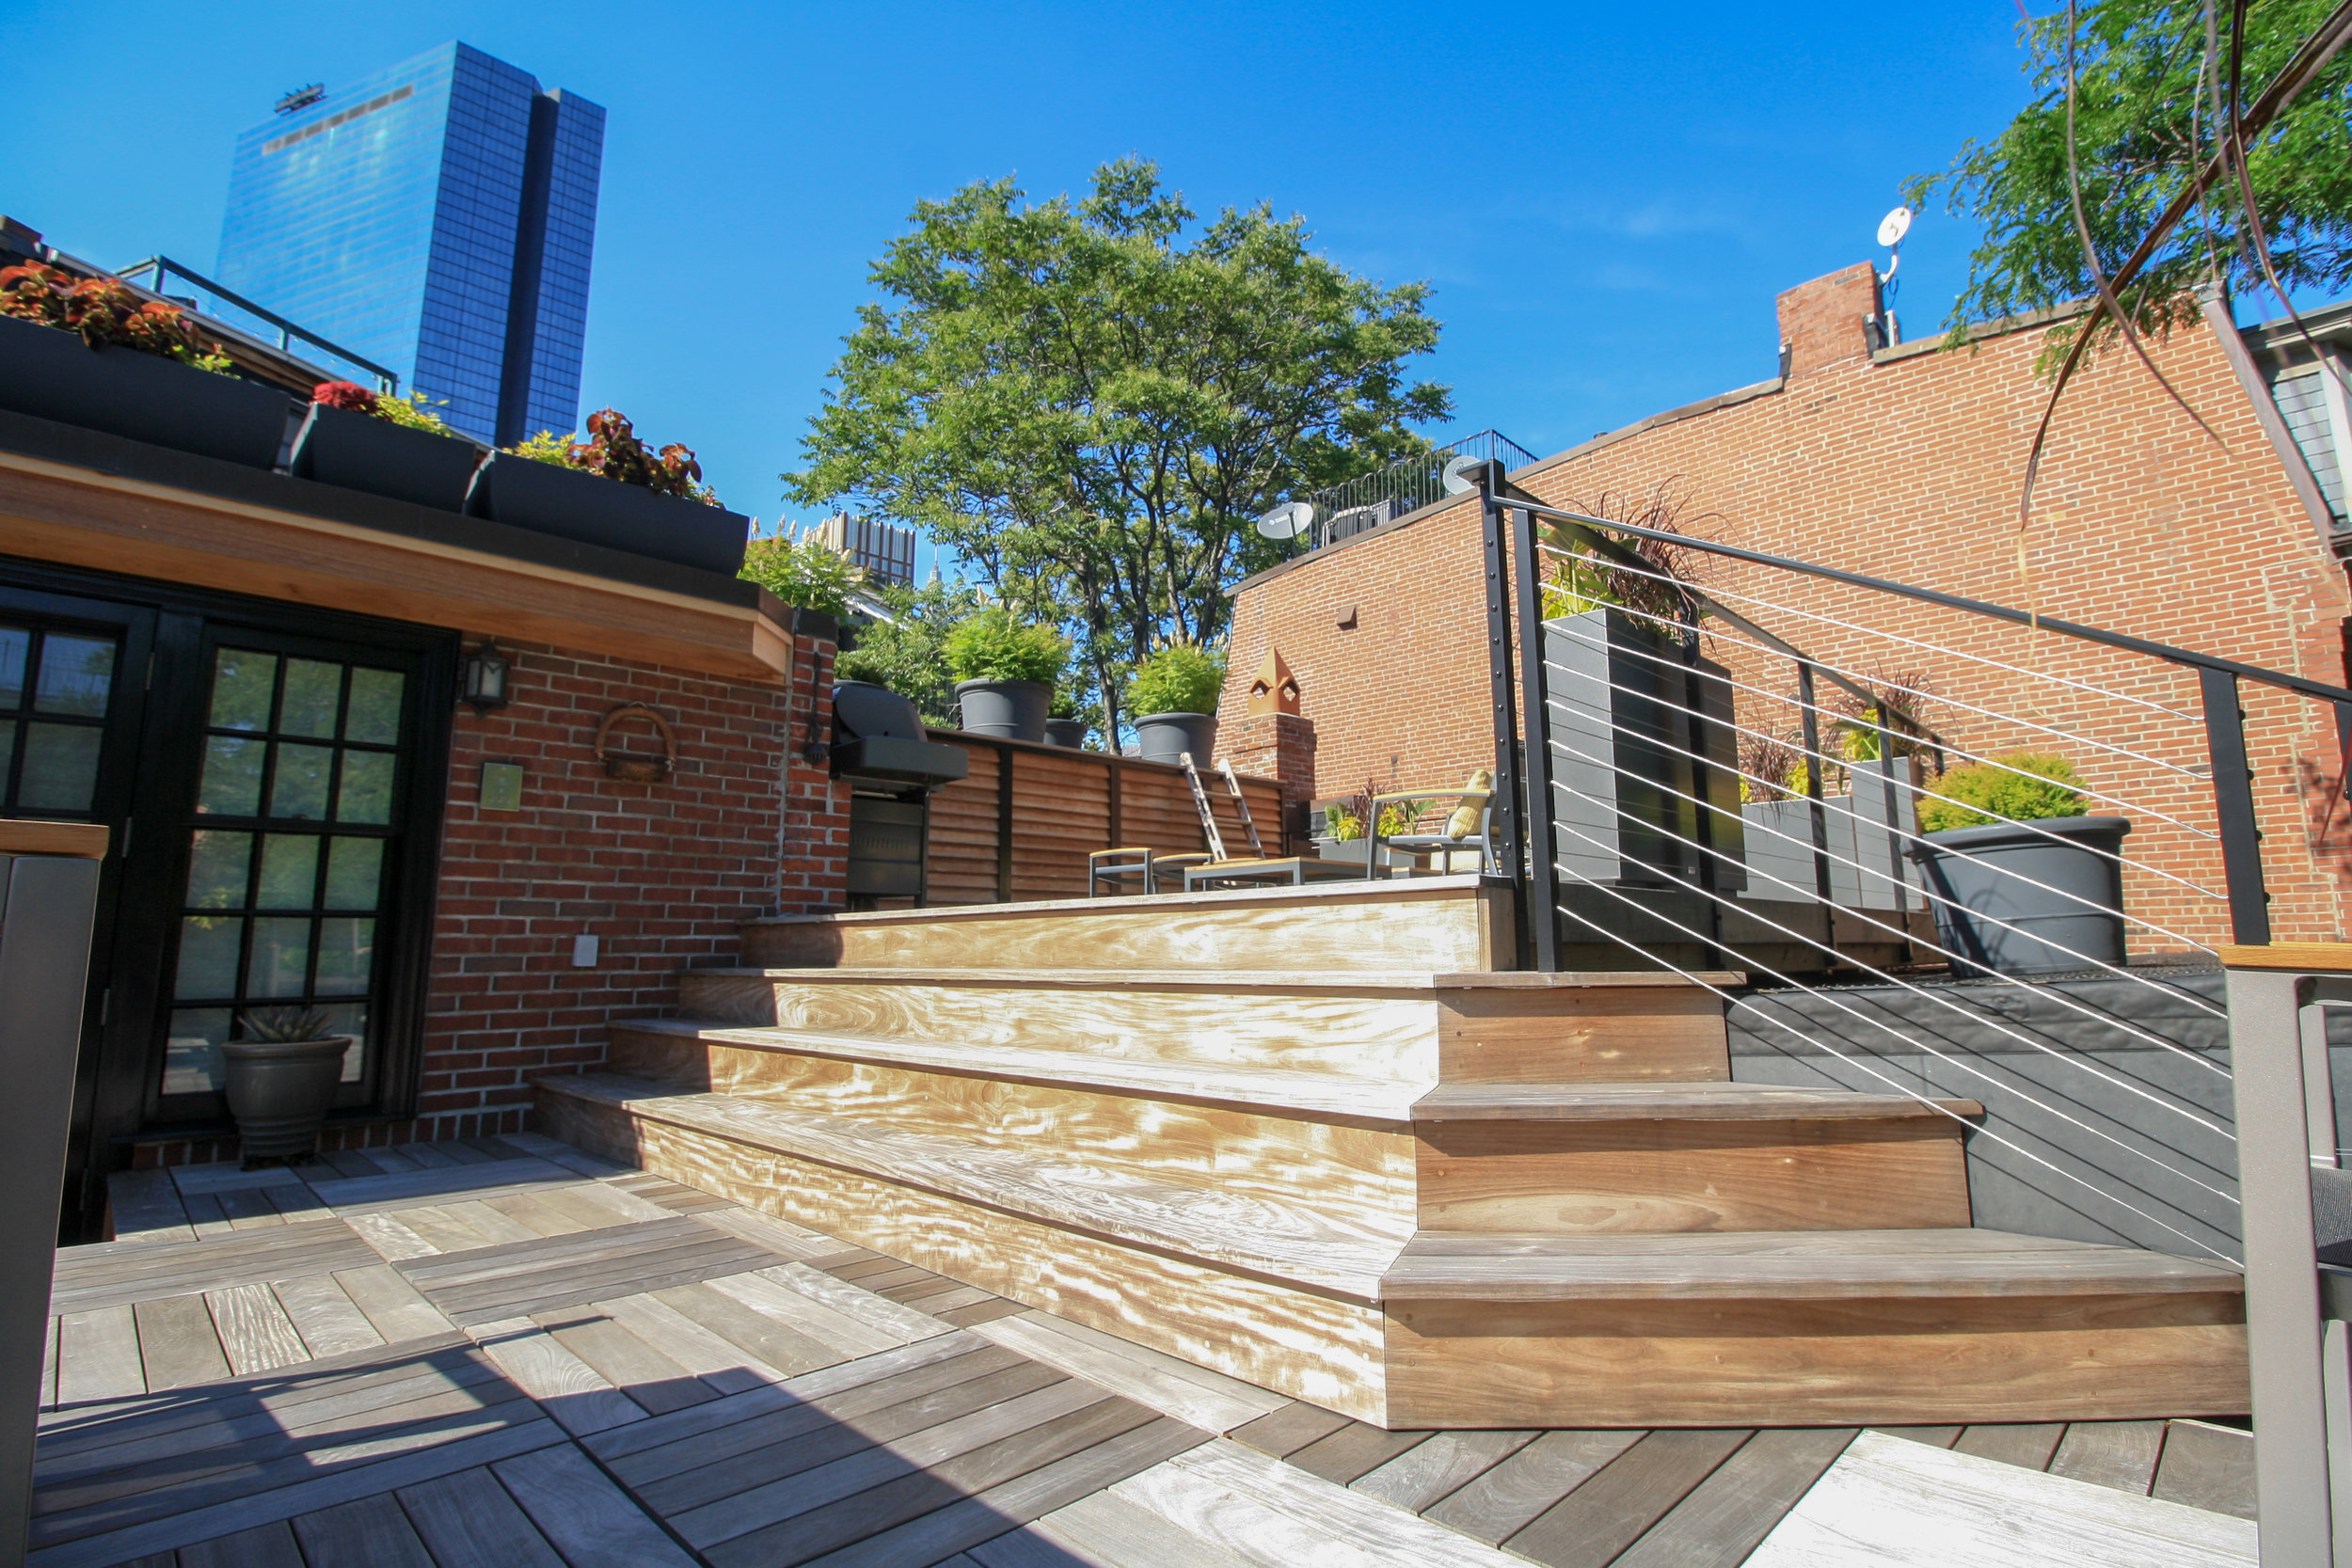 recover-residential-roof-deck-boston-20180628-24.jpg